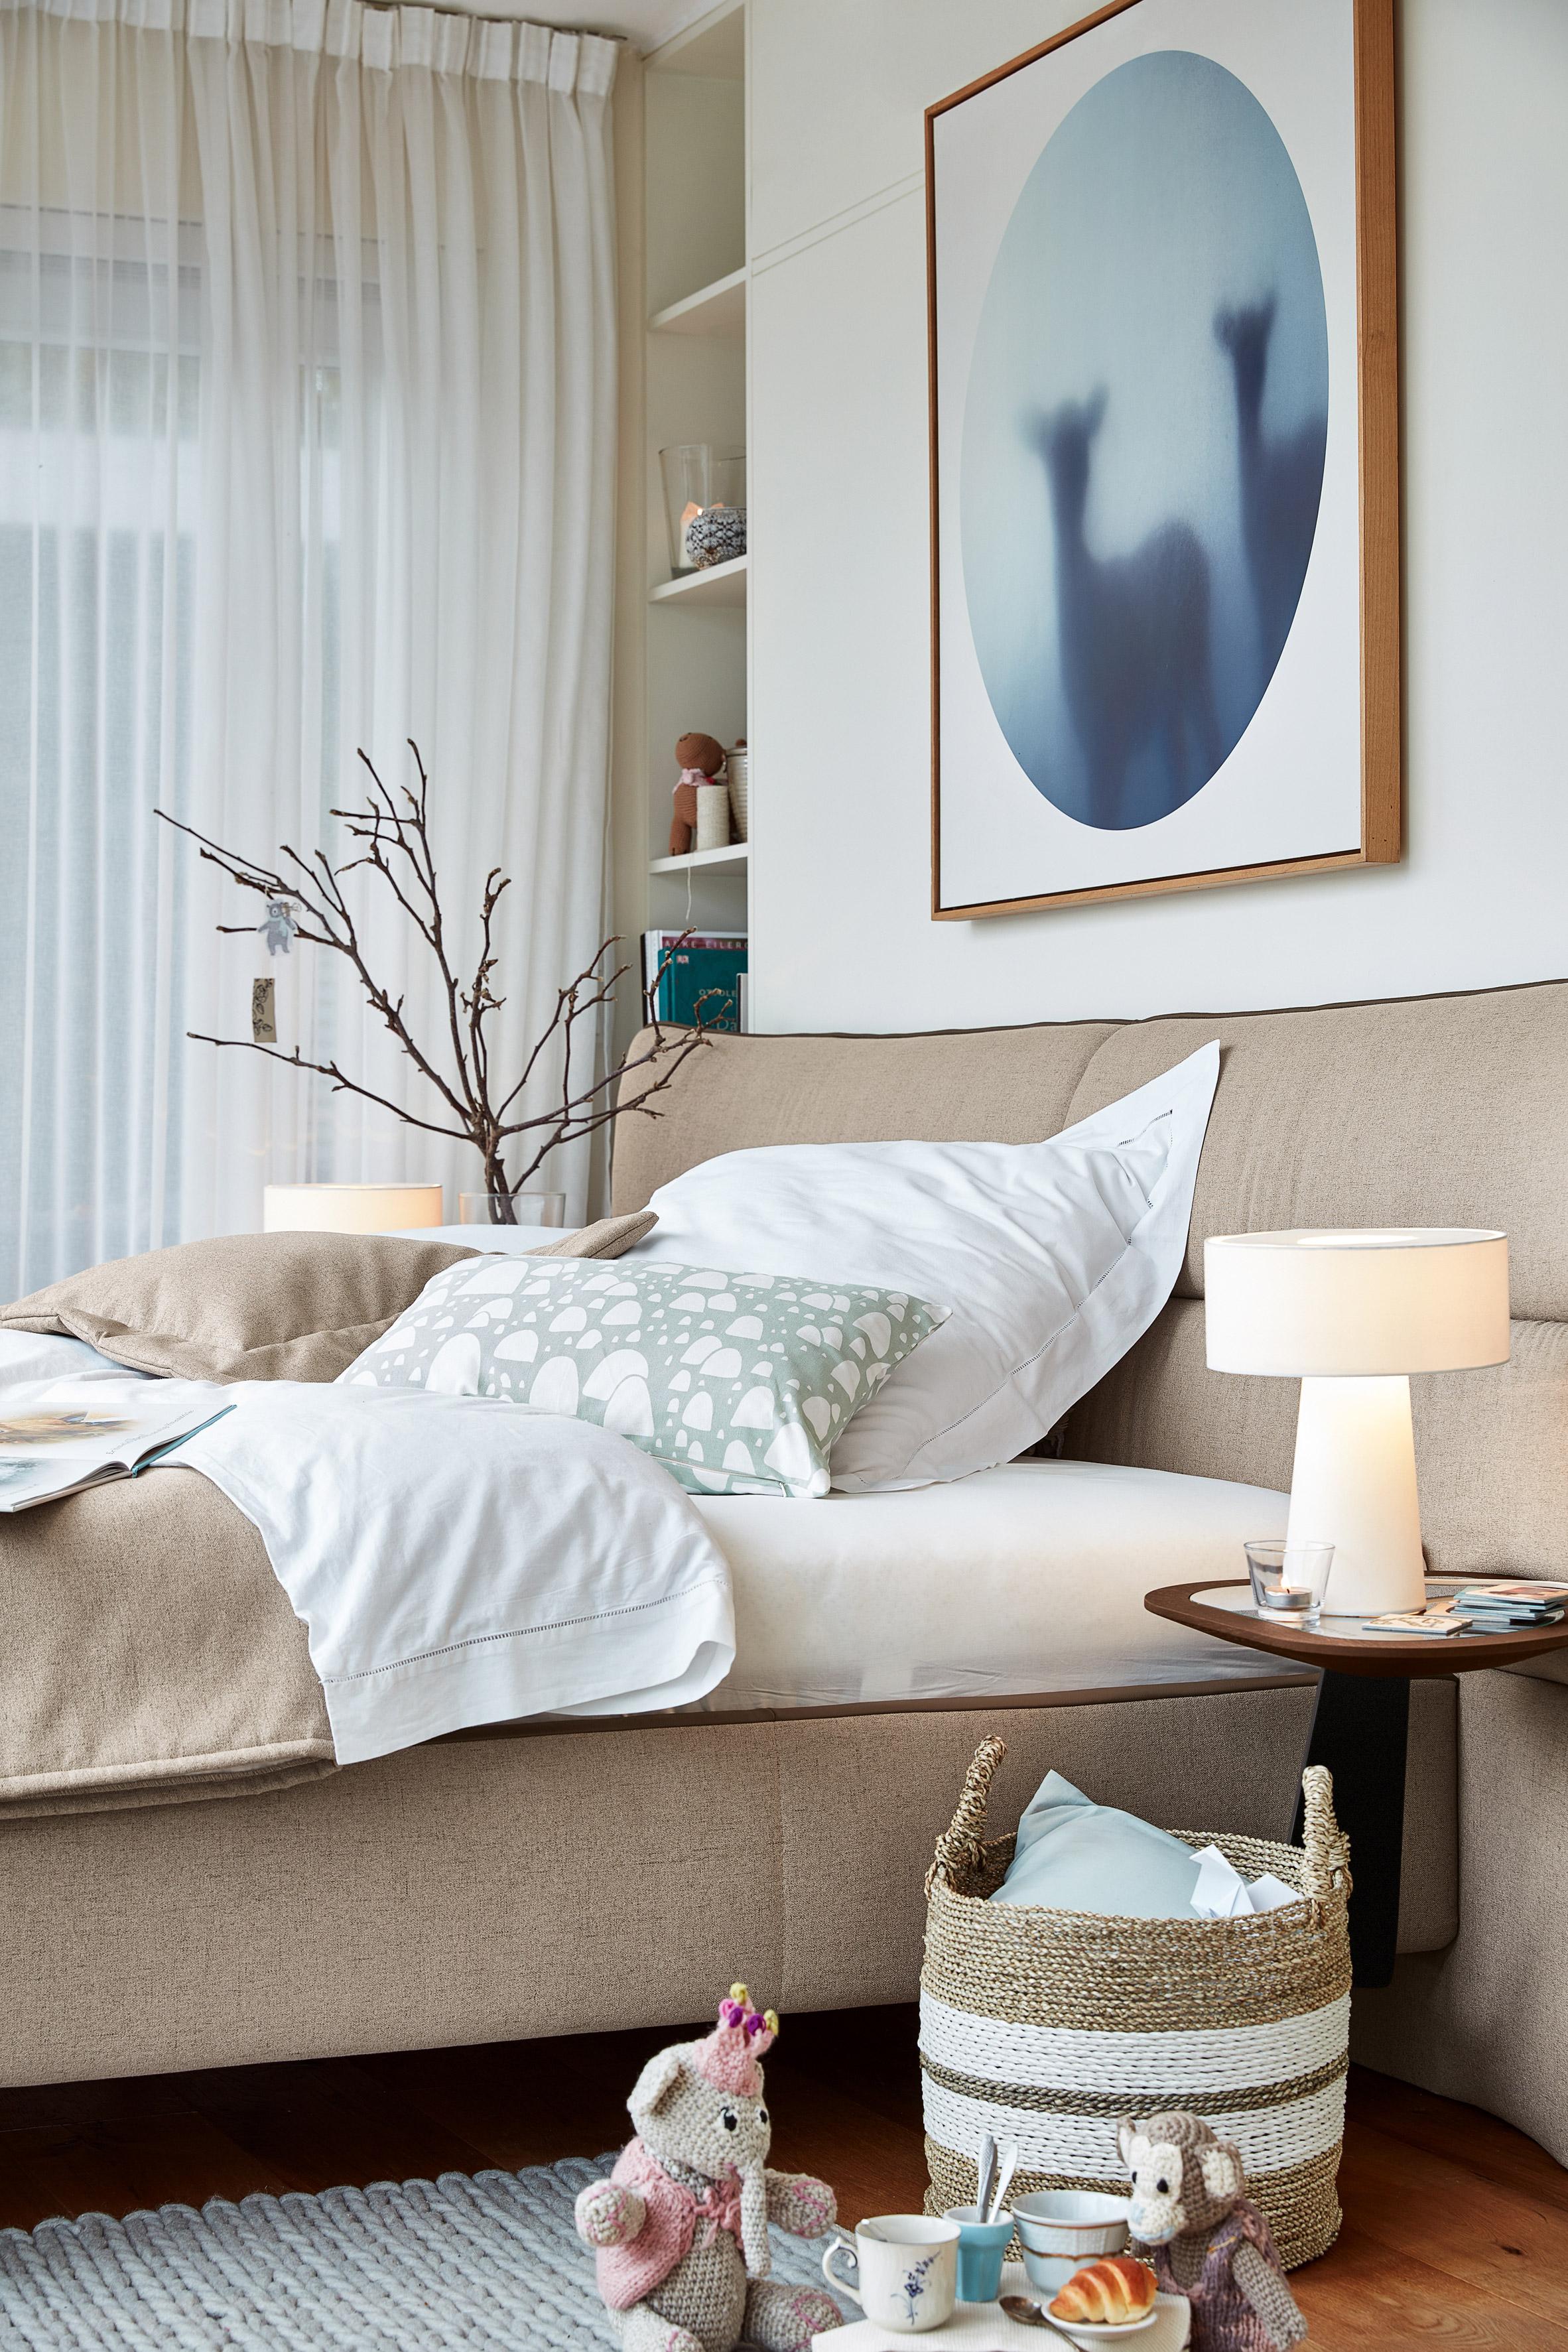 imm-cologne-2017-design-furniture-beds-birkenstock_dezeen_2364_col_23